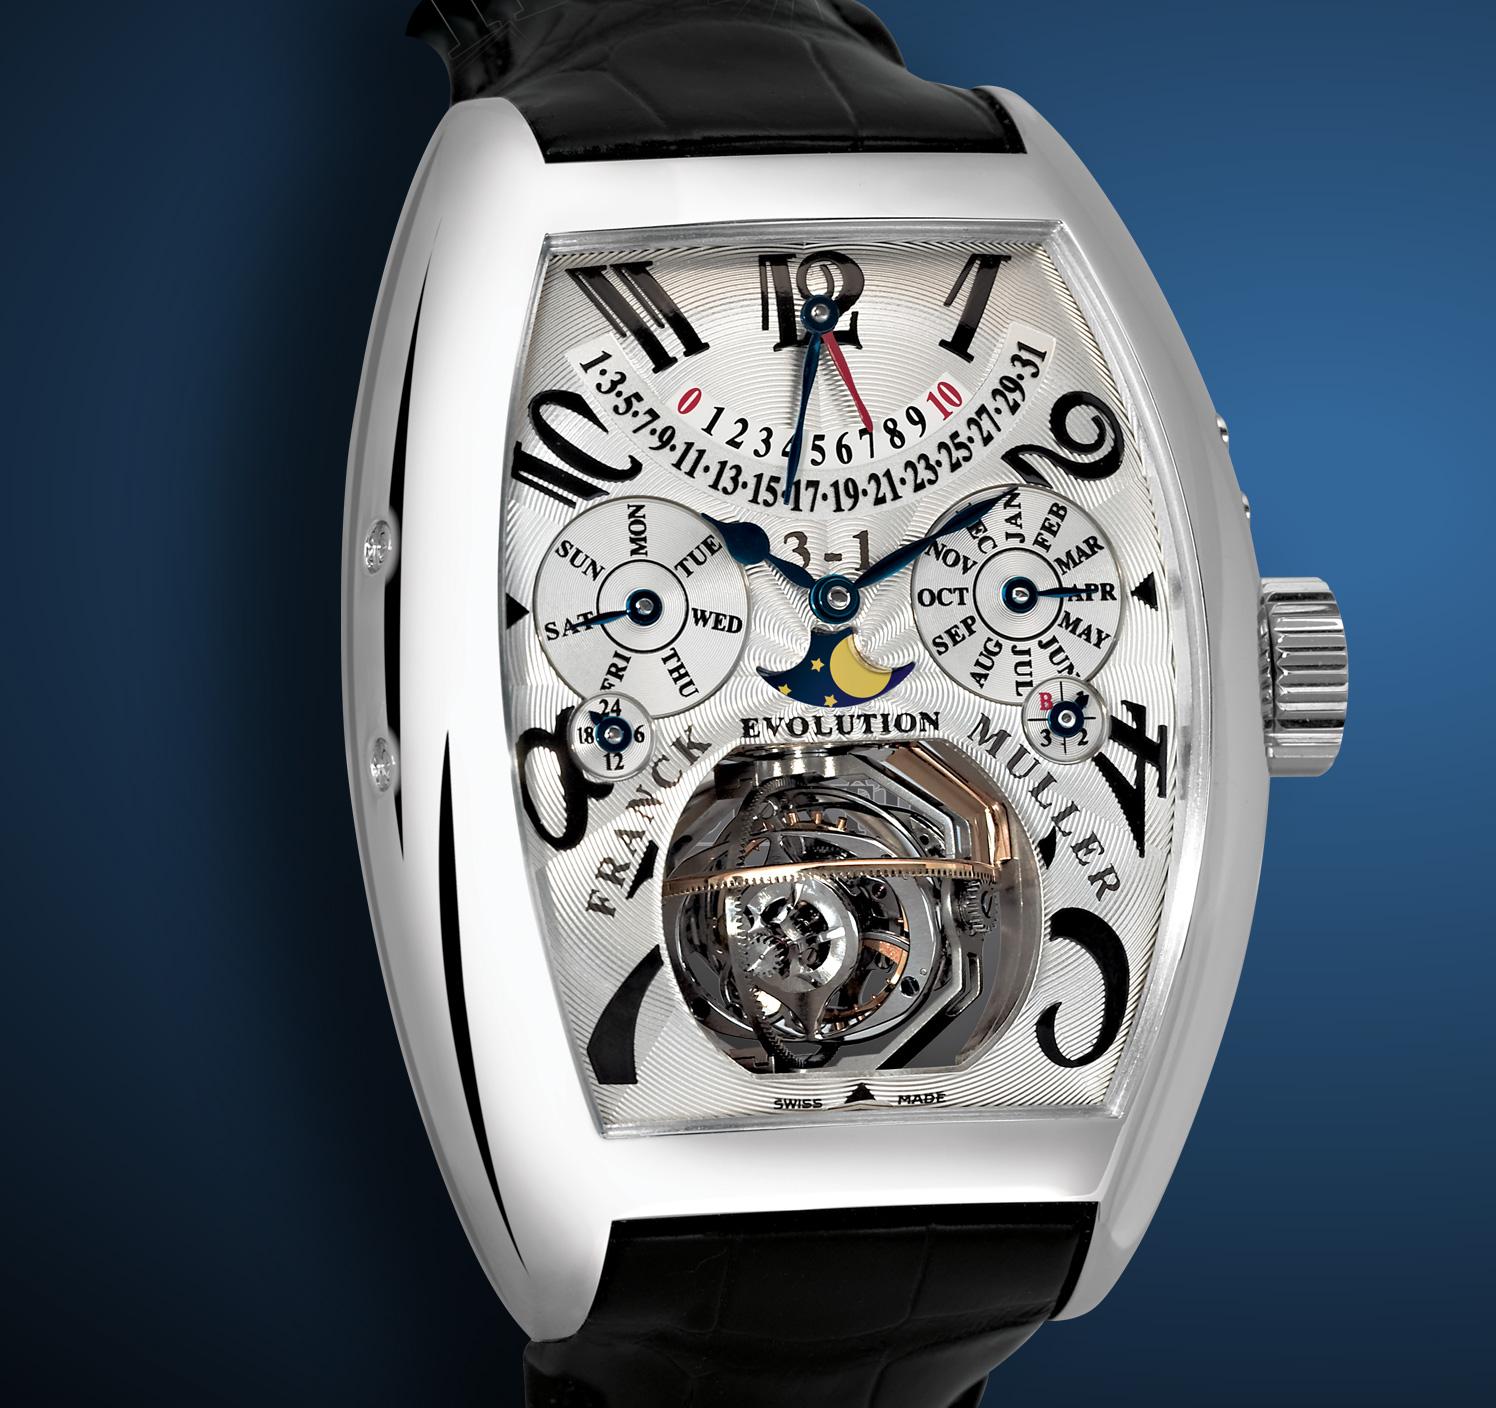 часы Franck Muller Evolution 3-1